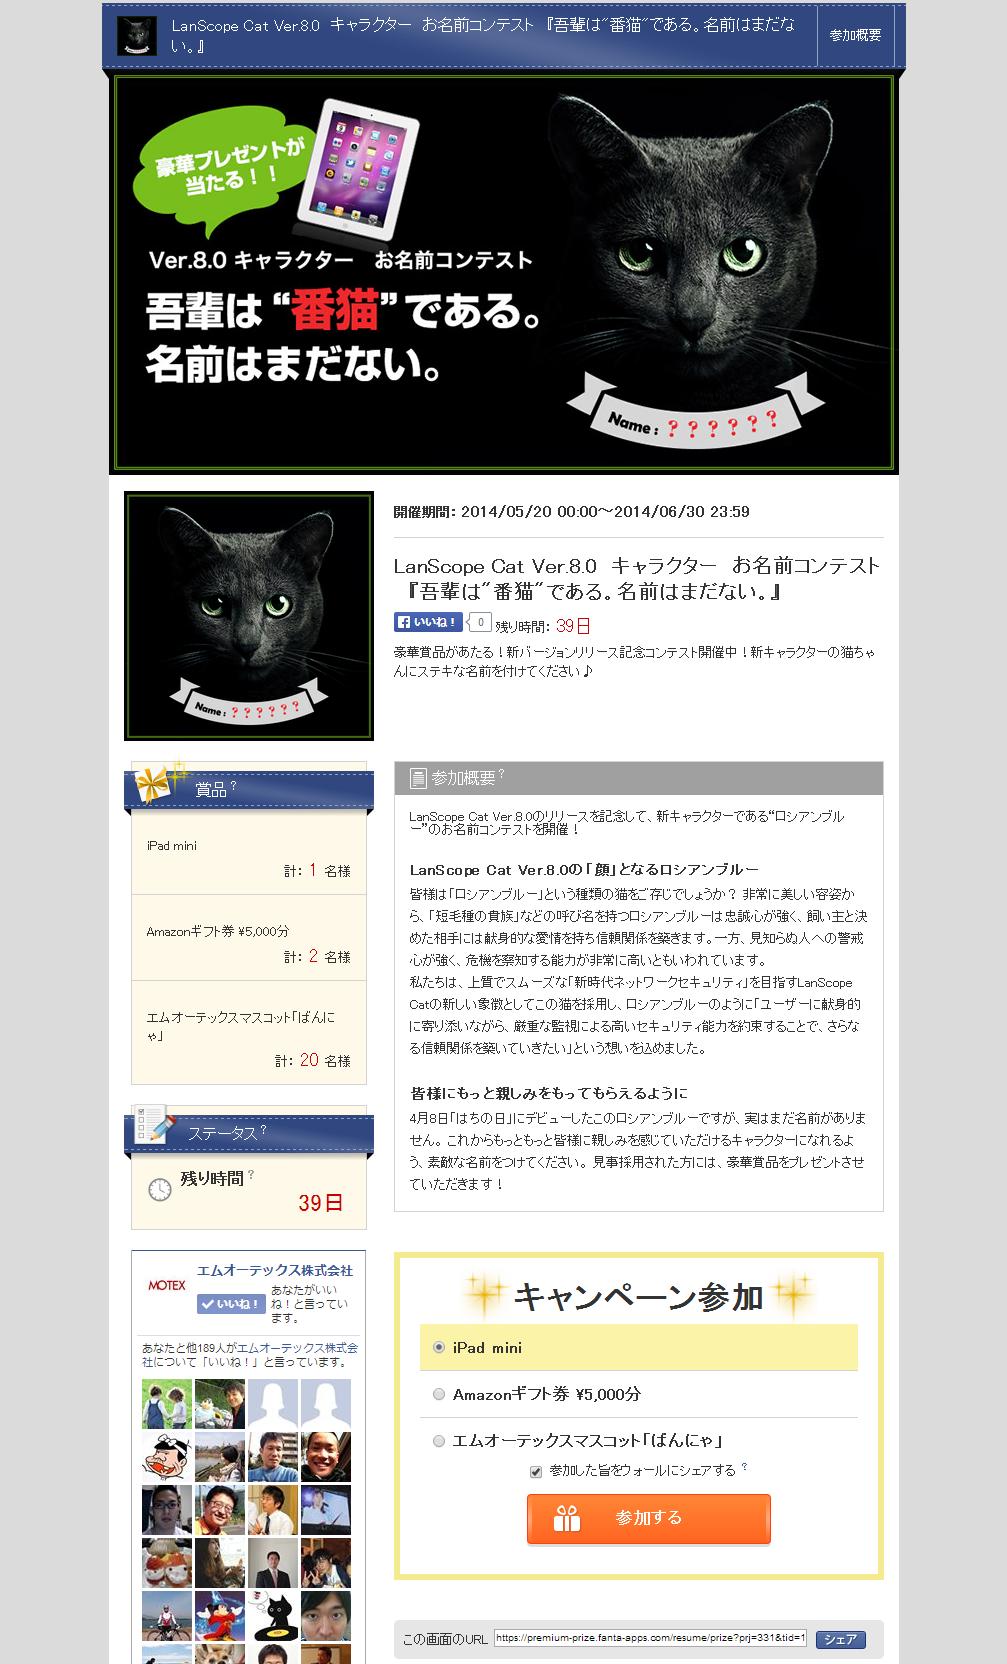 Fantastics懸賞アプリ(エムオーテックス株式会社様)